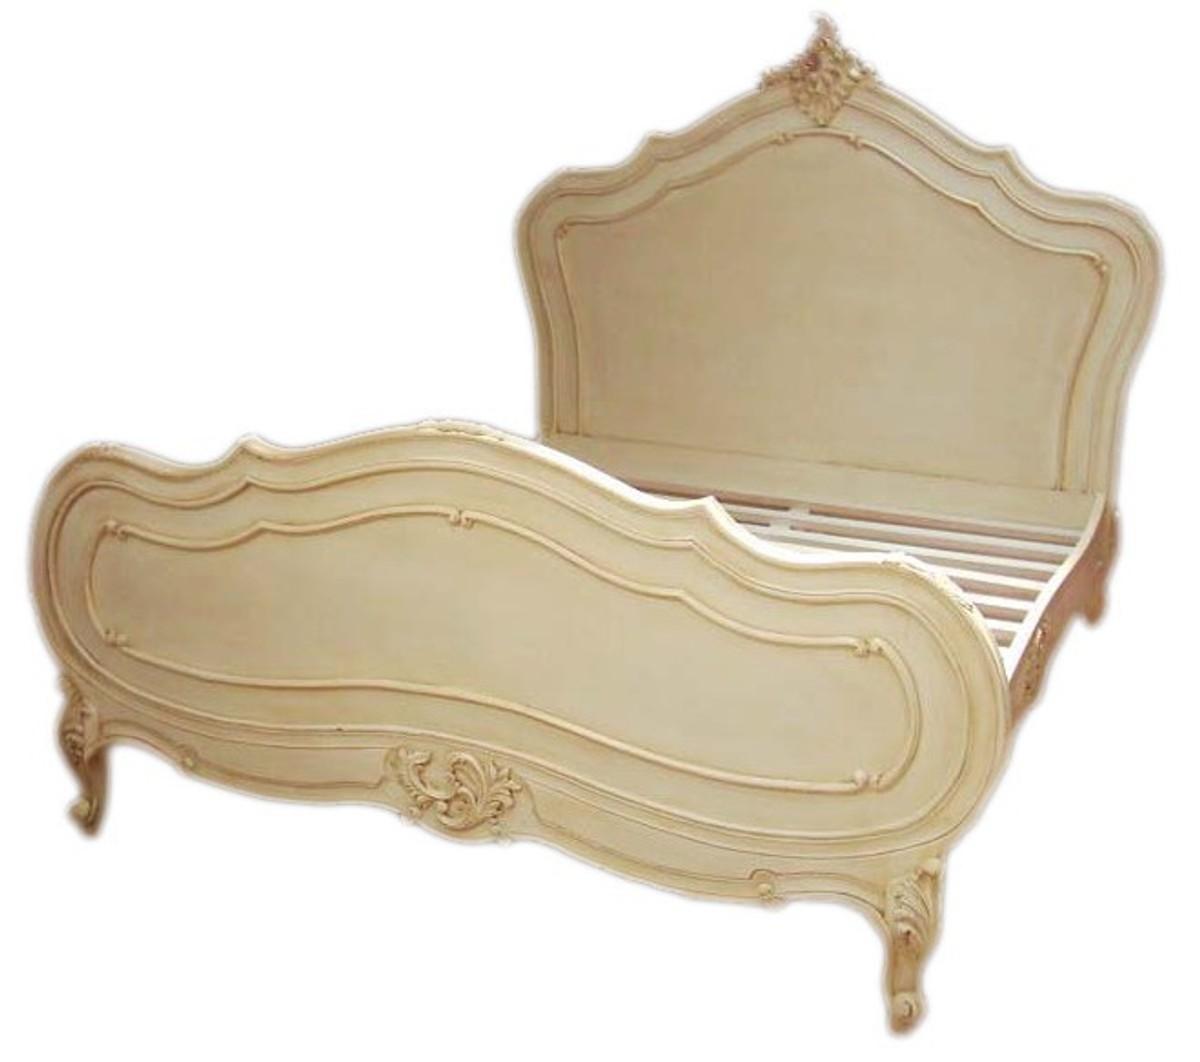 Full Size of Barock Bett Maison Paris Antik Creme 180 200 Cm Aus Der Luxus 140x200 Zum Ausziehen 200x180 Ausgefallene Betten Billige 160x200 Komplett Möbel Boss Kaufen Bett Barock Bett